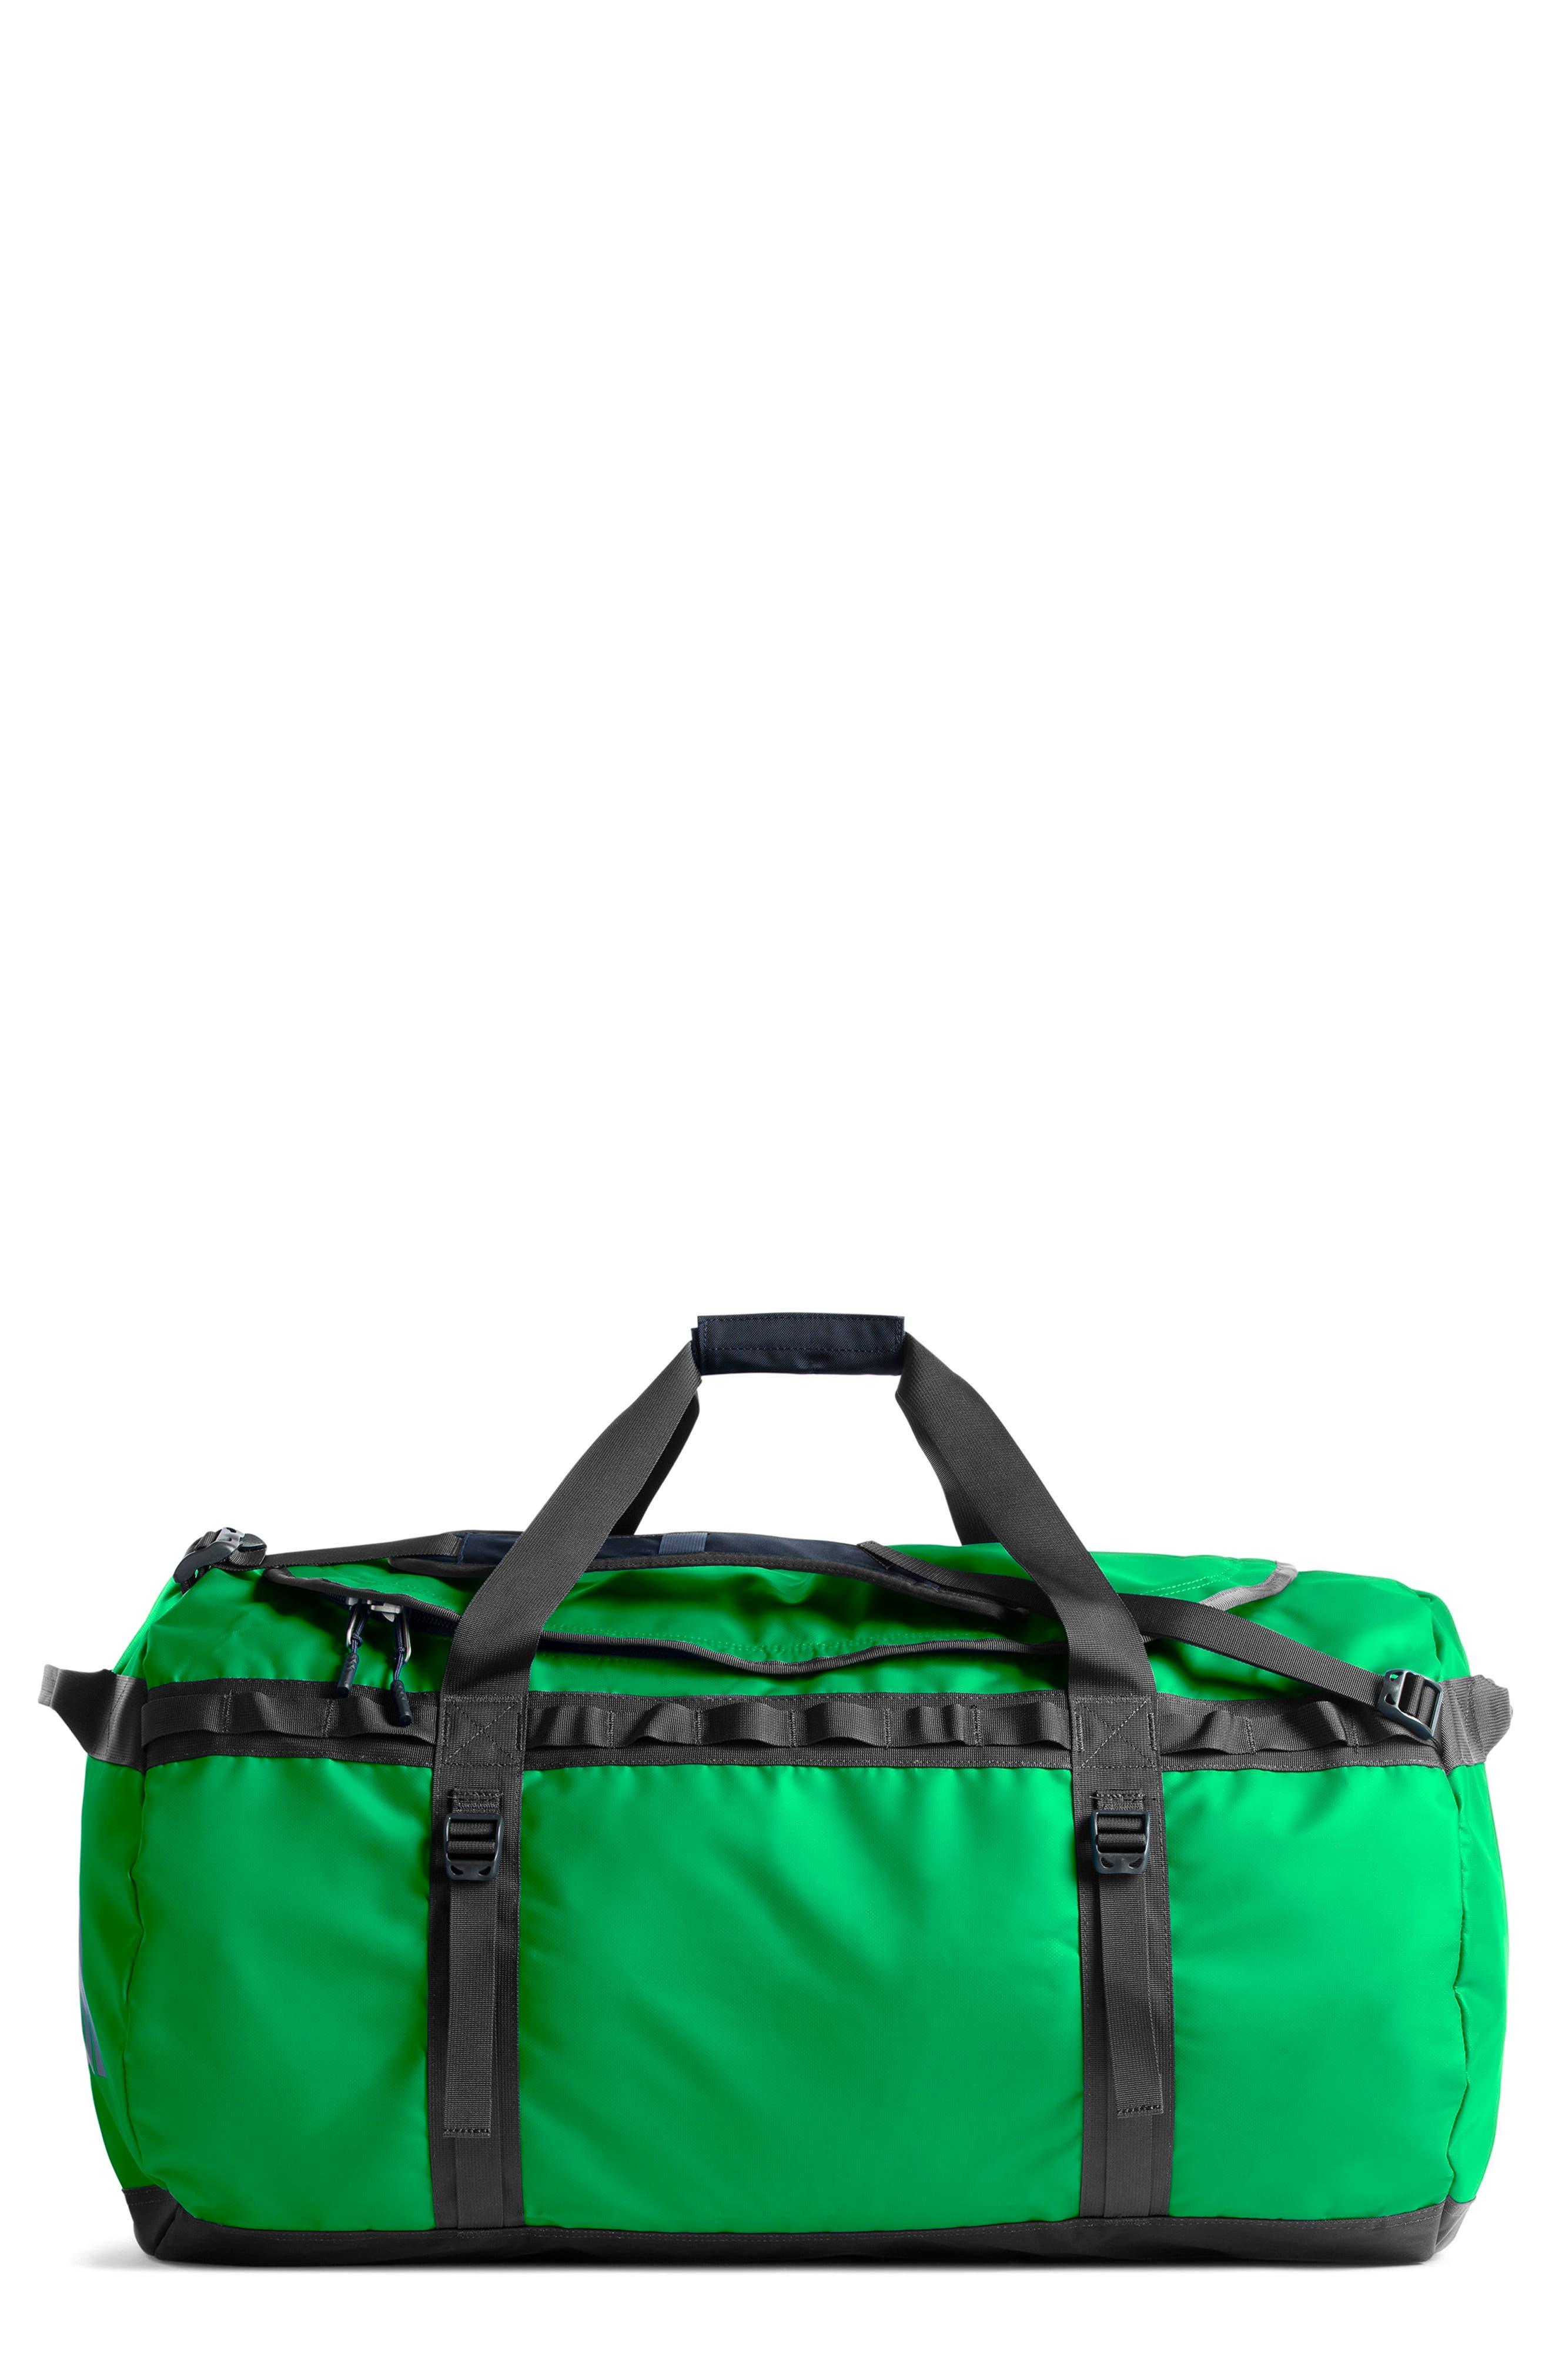 Base Camp XL Duffel Bag,                             Main thumbnail 1, color,                             GREEN/ ASPHALT GREY